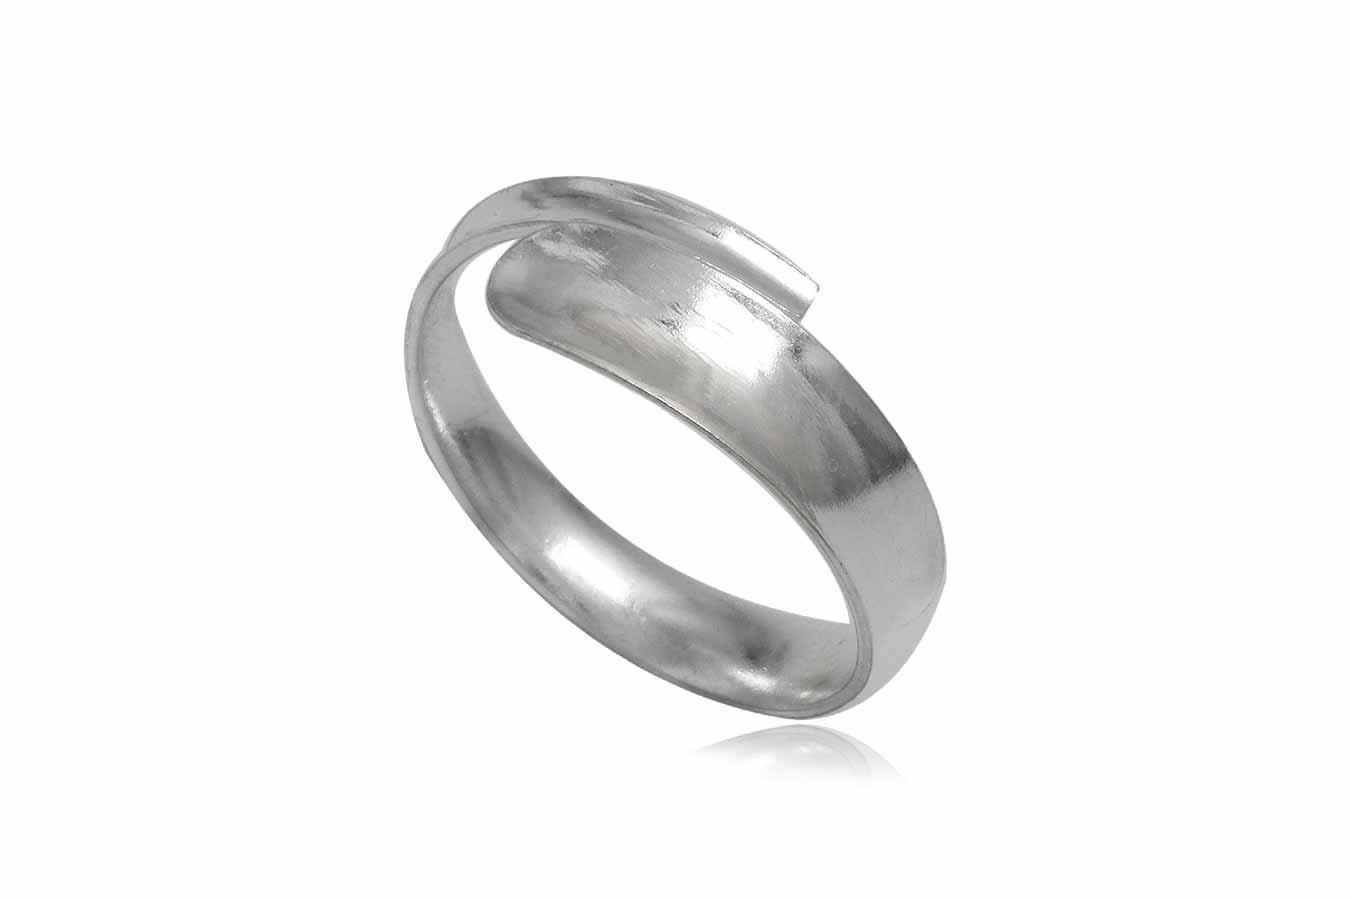 Inel Din Argint Simplu Tip Verigheta Magazin Online De Bijuterii